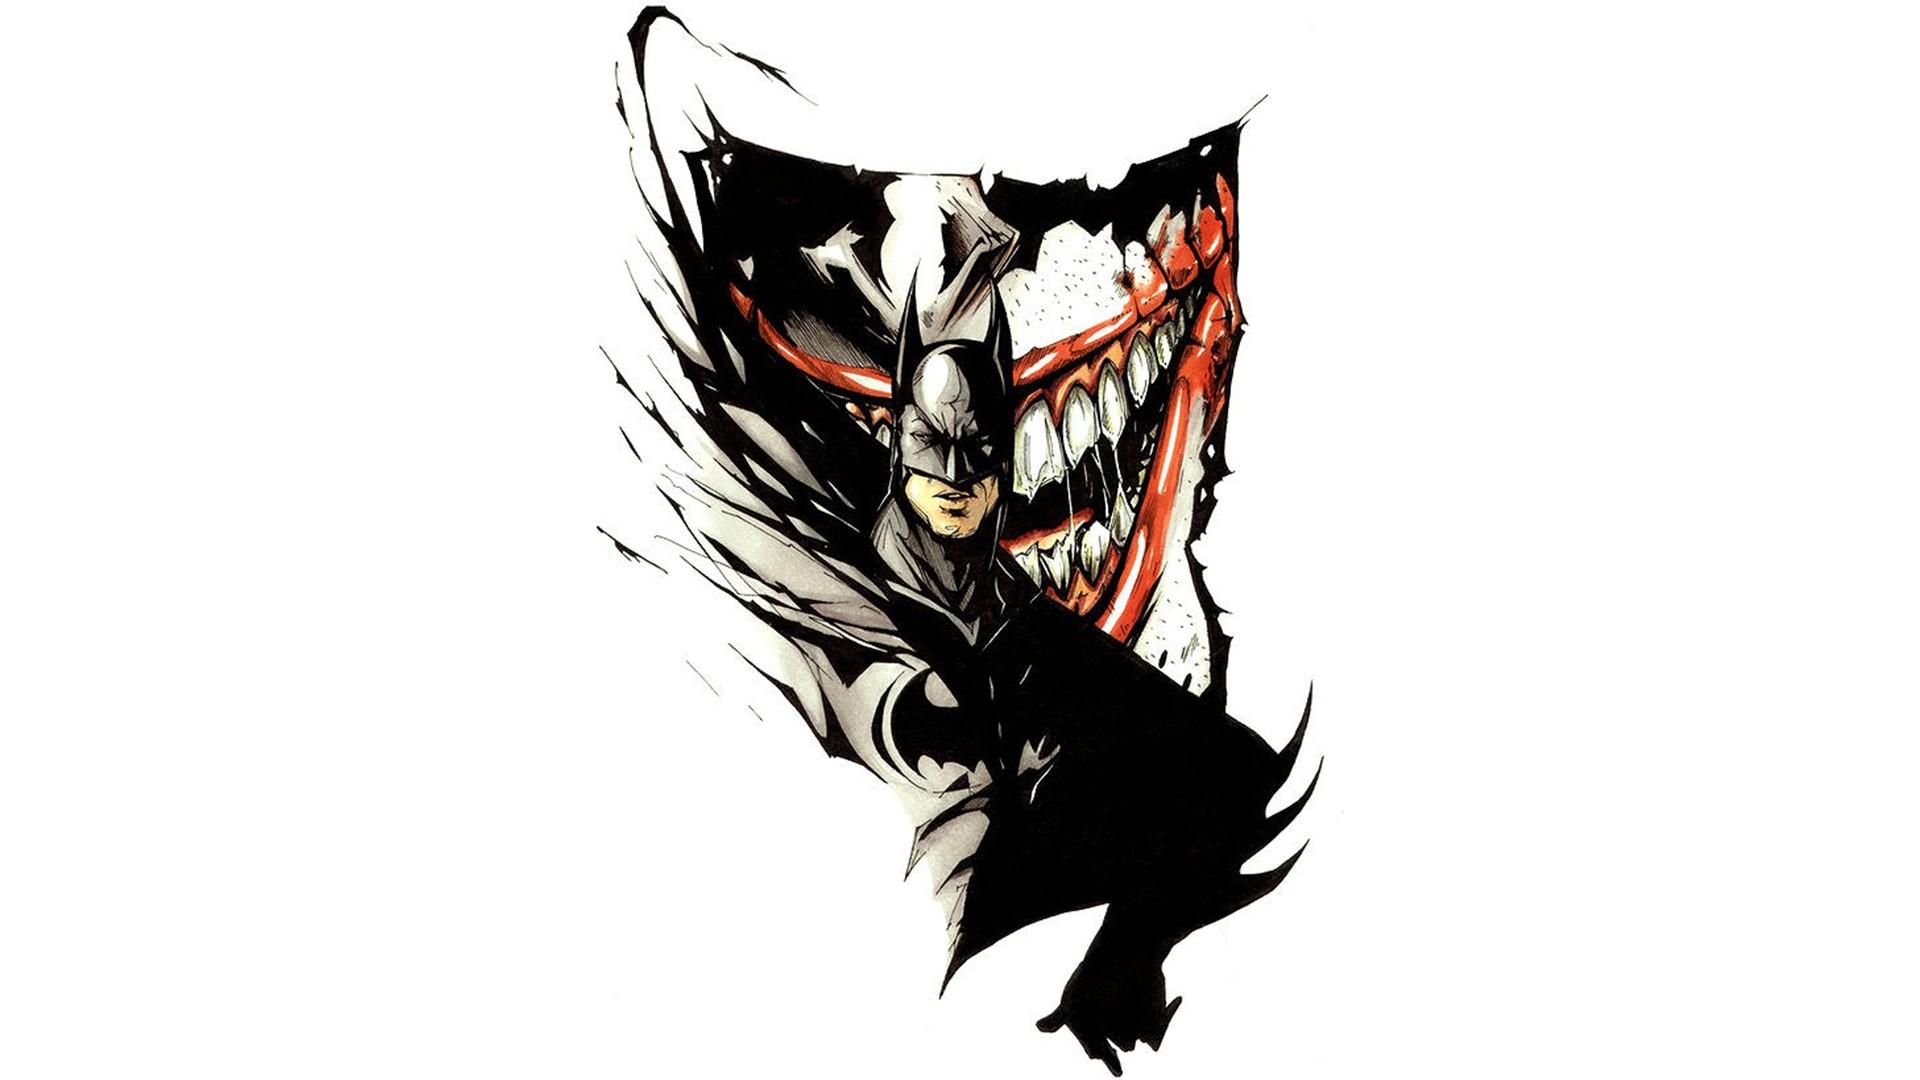 Art Vs Design : Joker wallpapers high quality download free